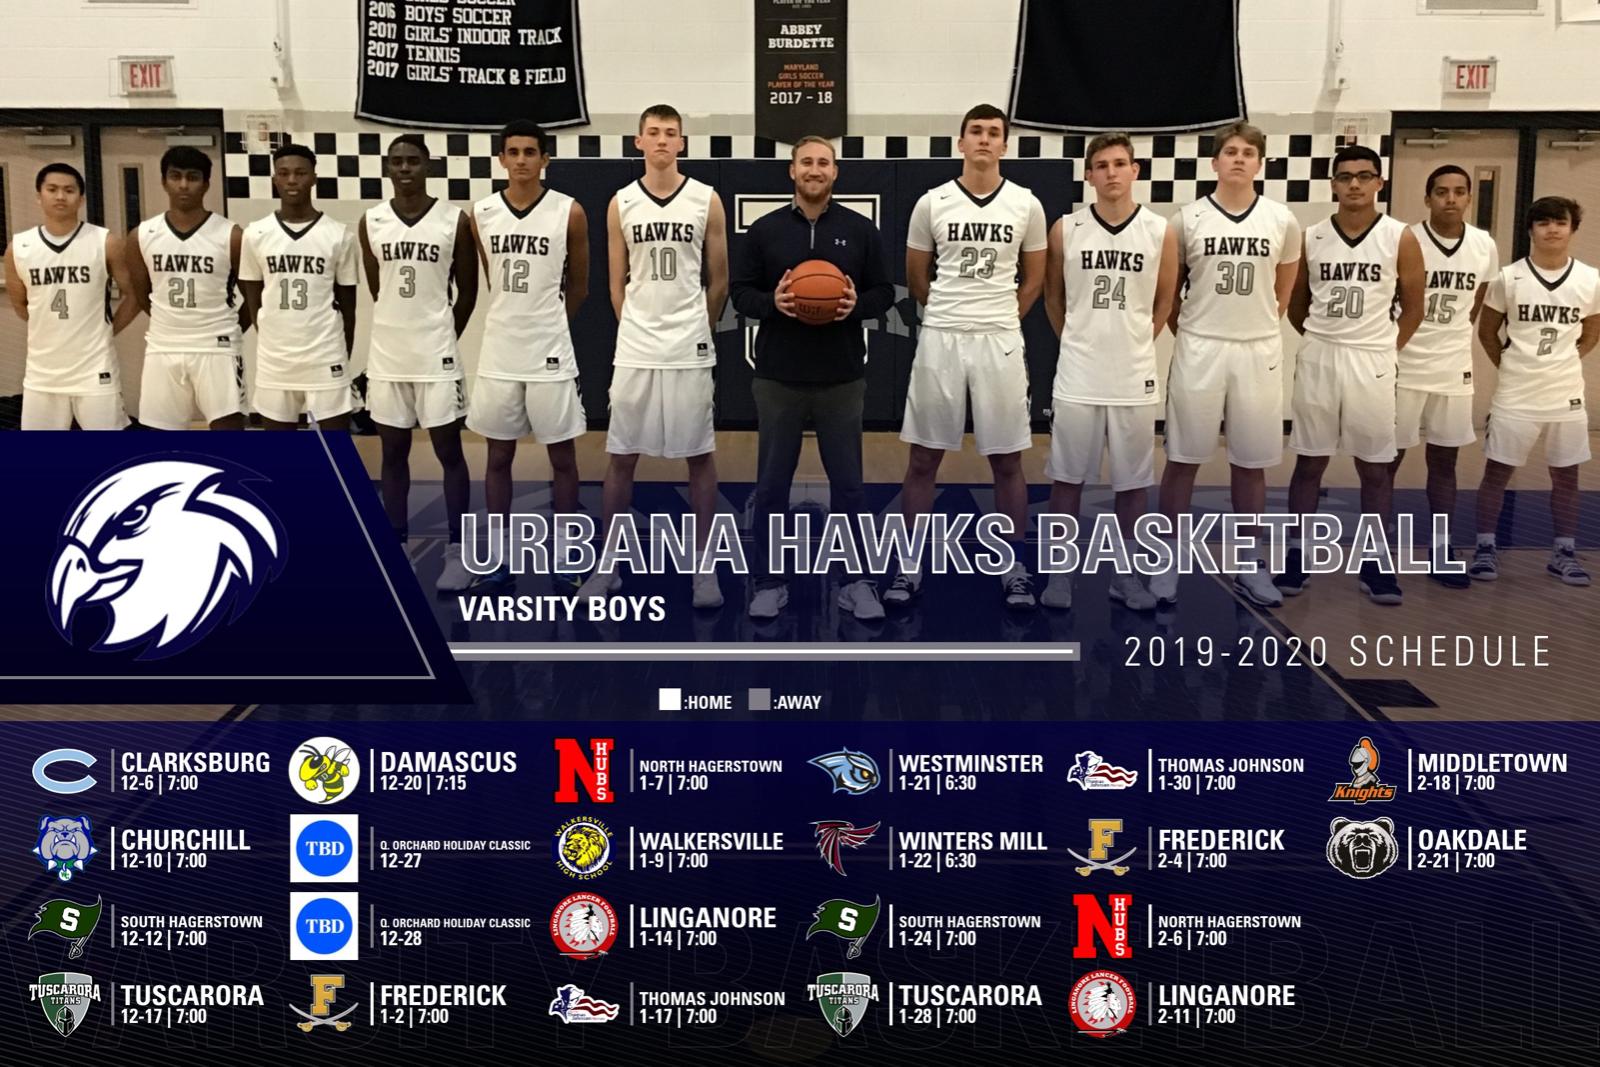 2019-20 Hawks Basketball schedule announcement